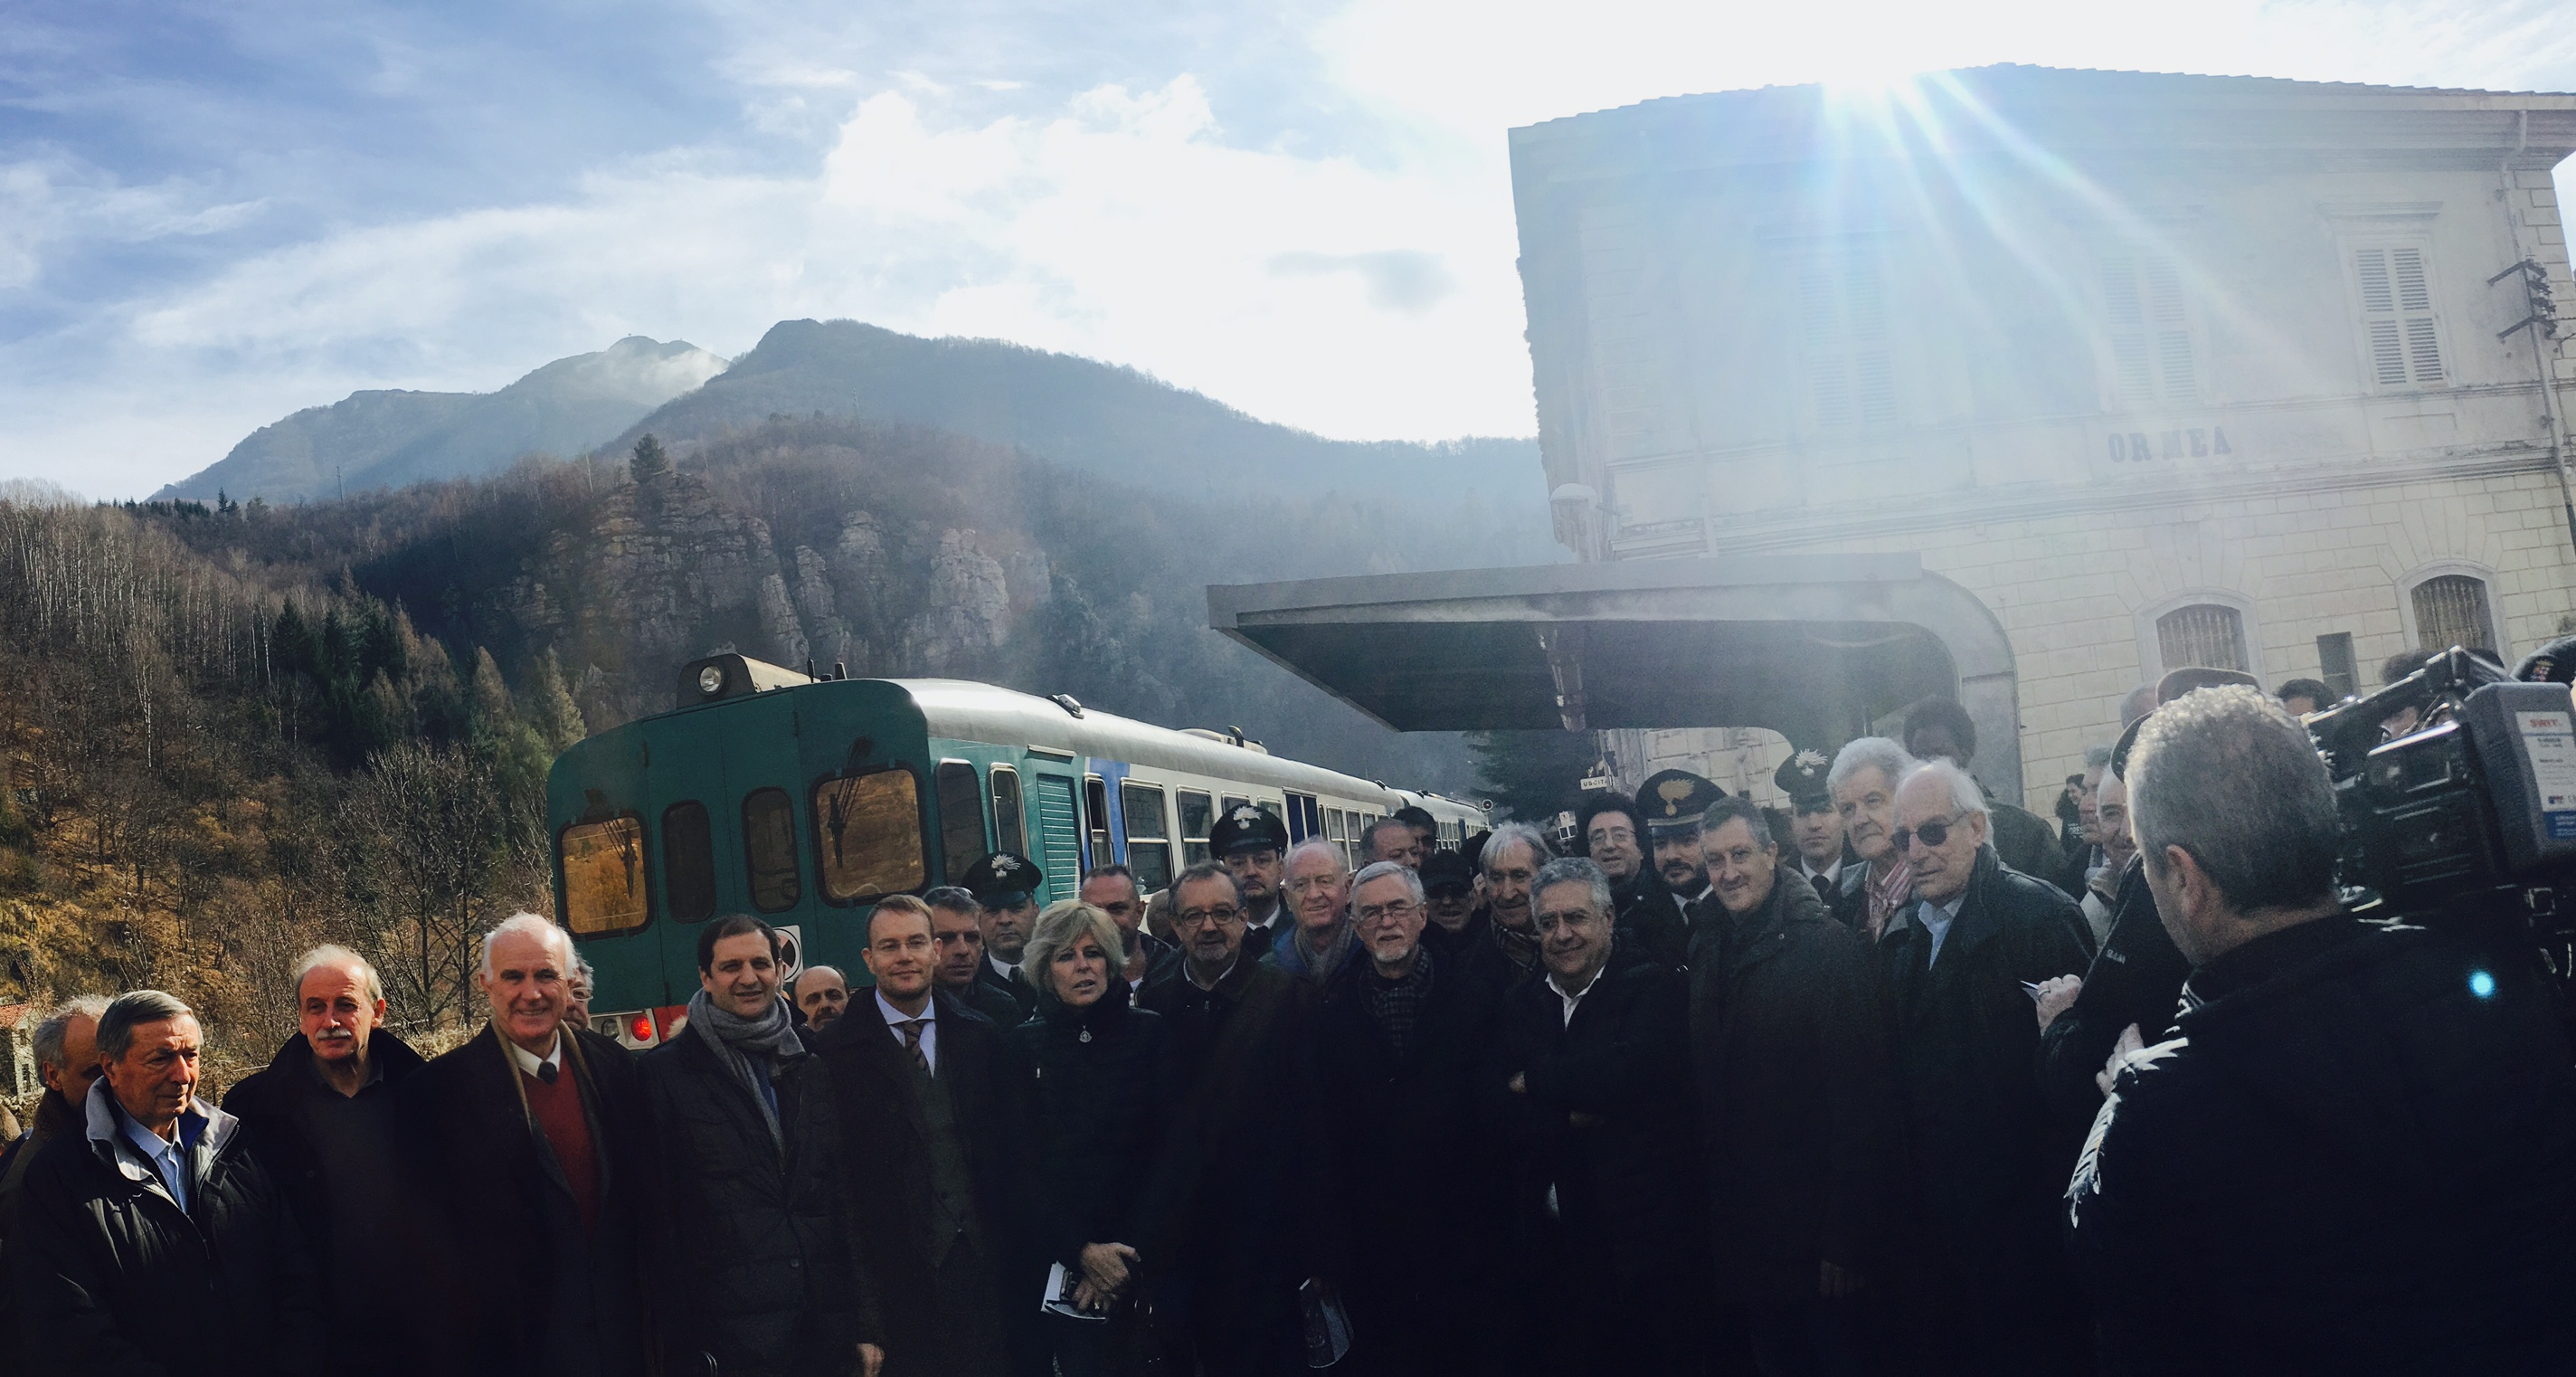 La Guida - Riapre al turismo la ferrovia Ceva-Ormea